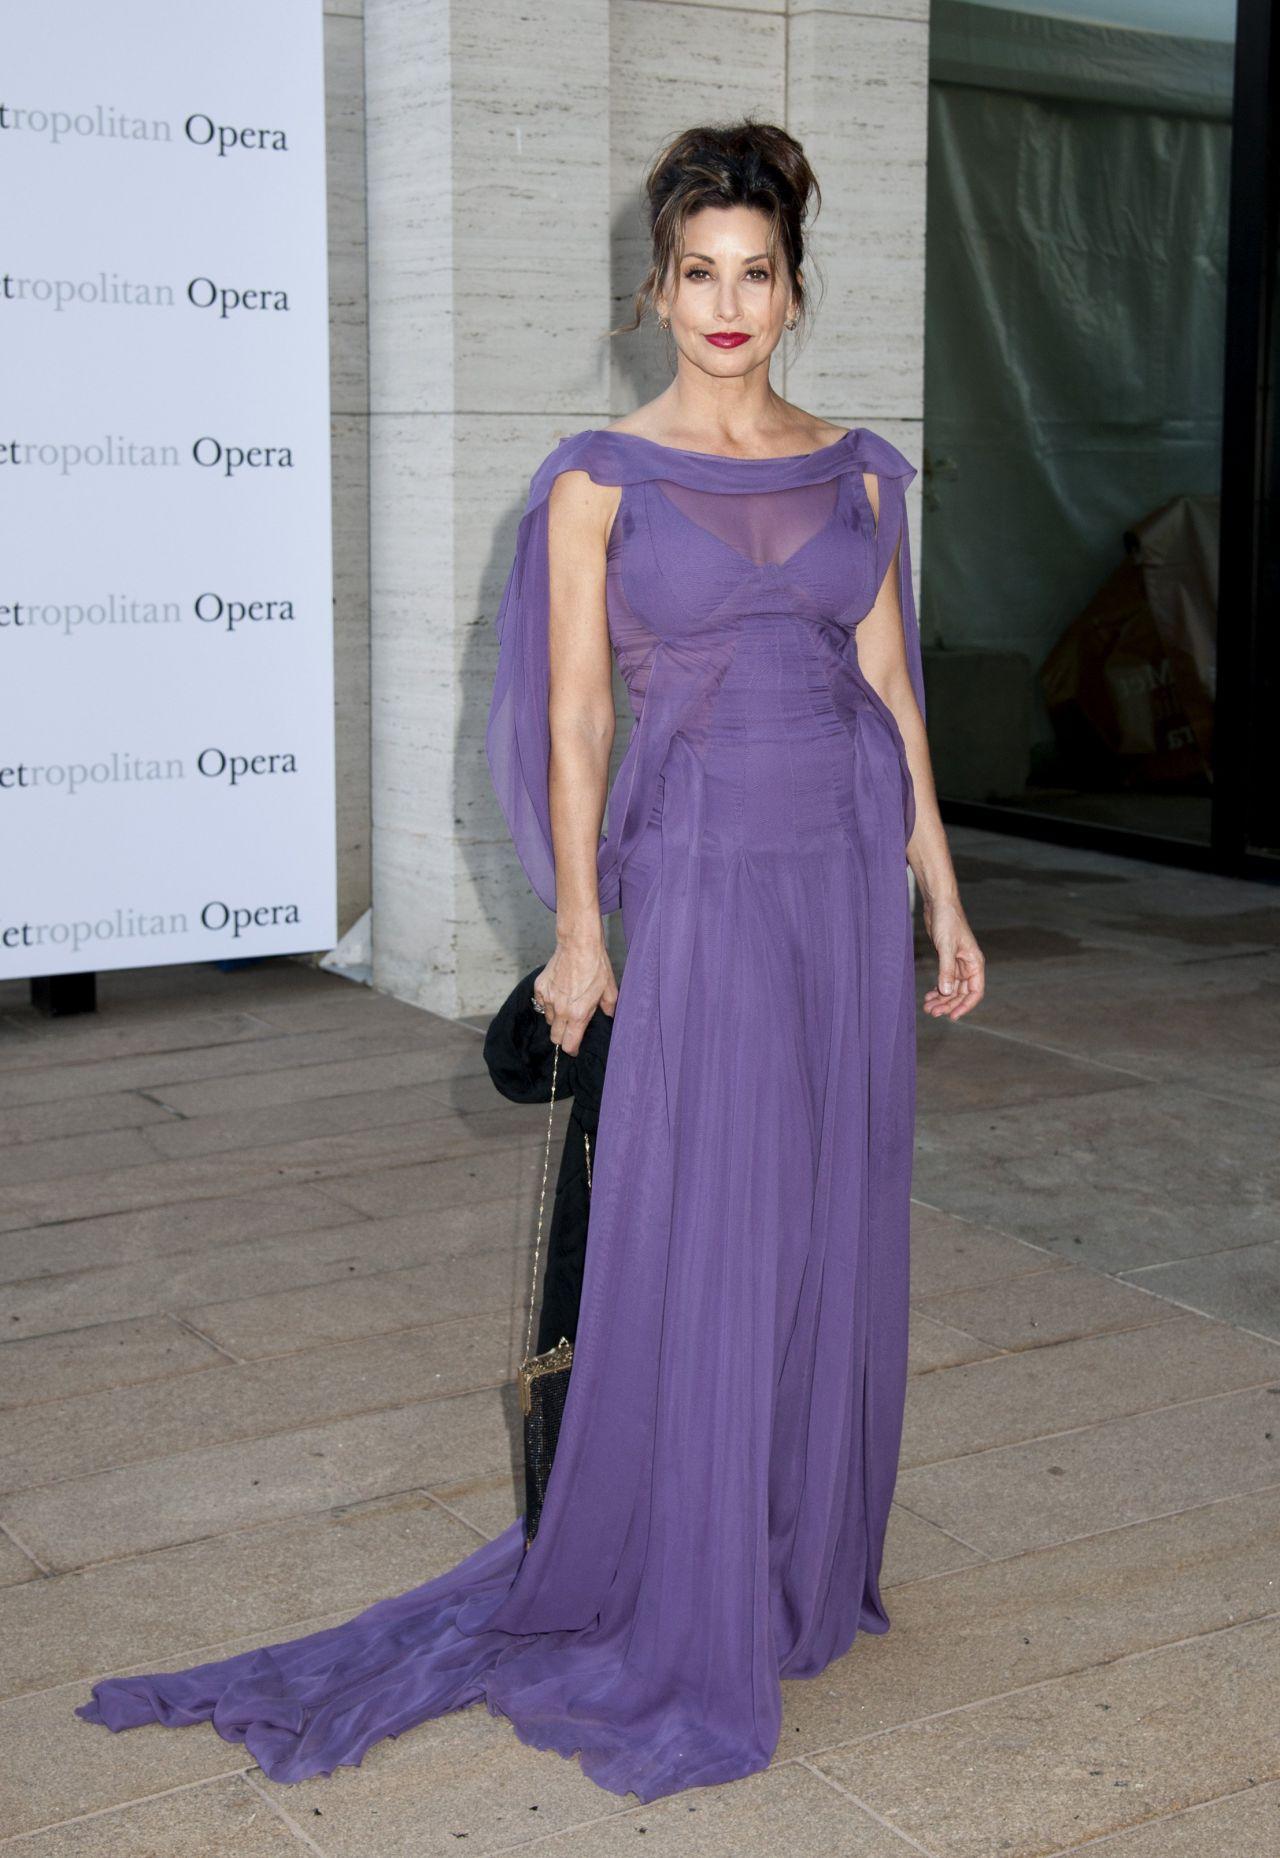 Gina Gershon – Metropolitan Opera /2015 Season Opening in New